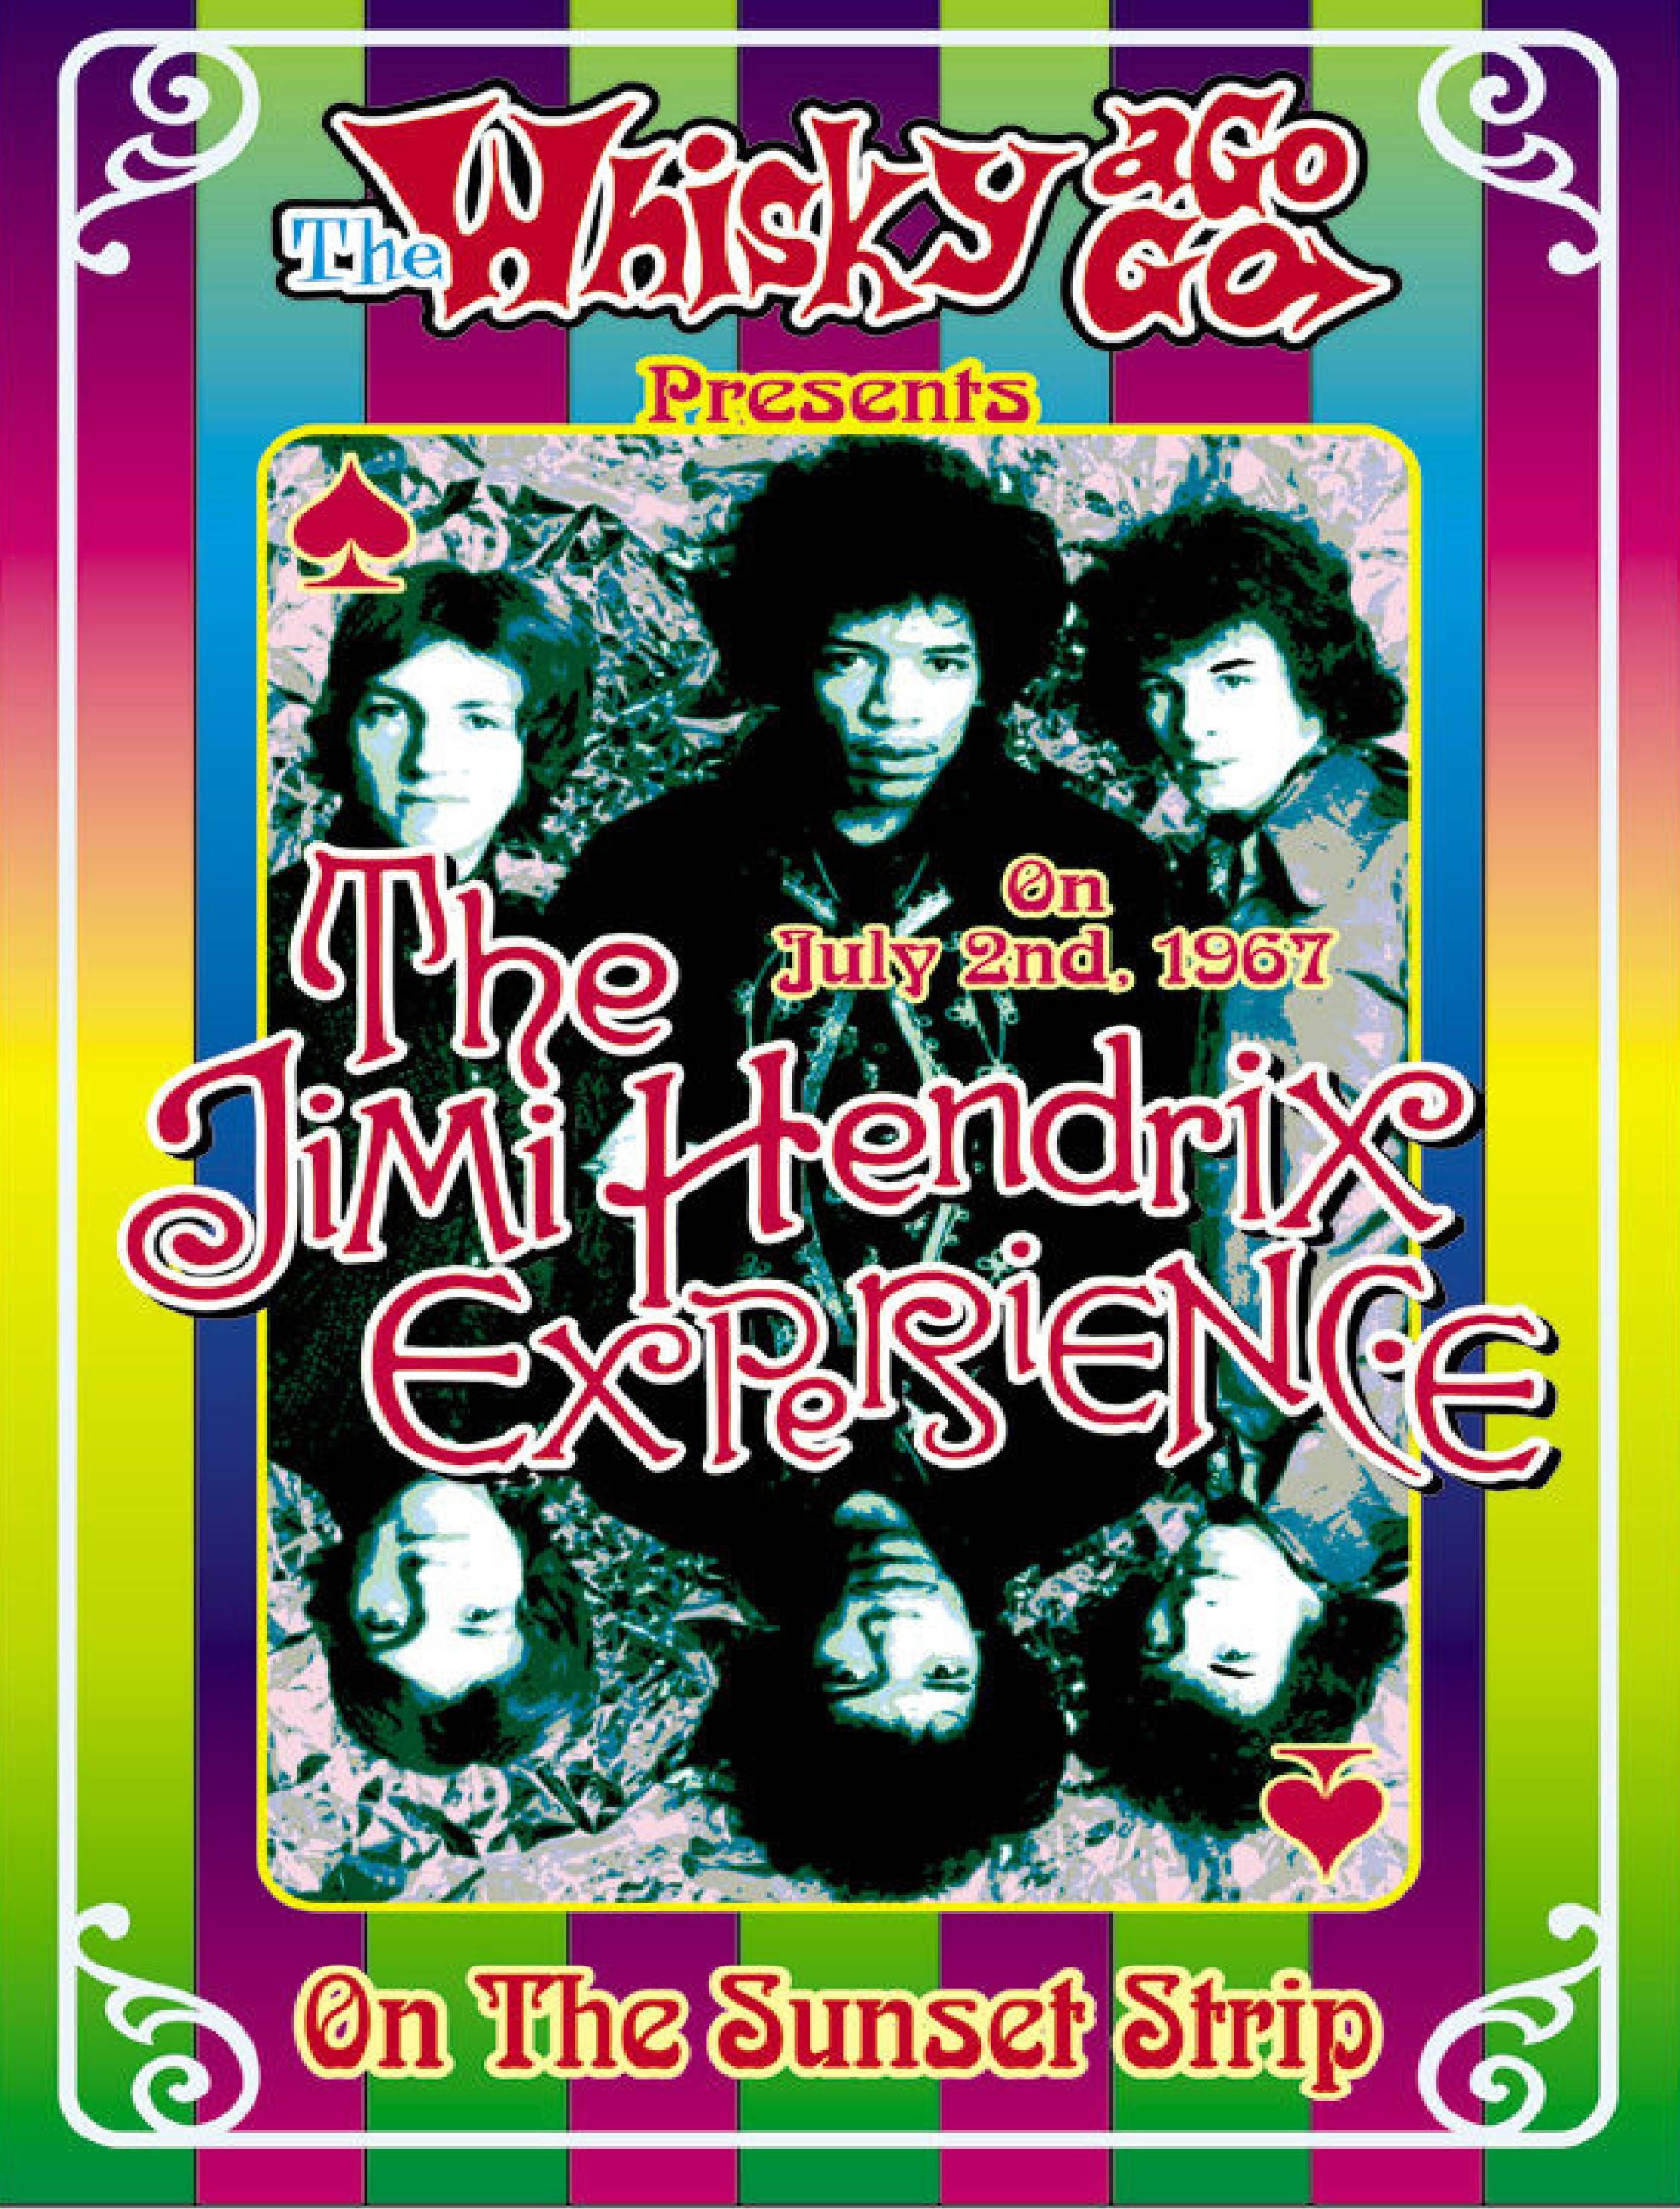 jimi hendrix concert poster classic rock concert posters